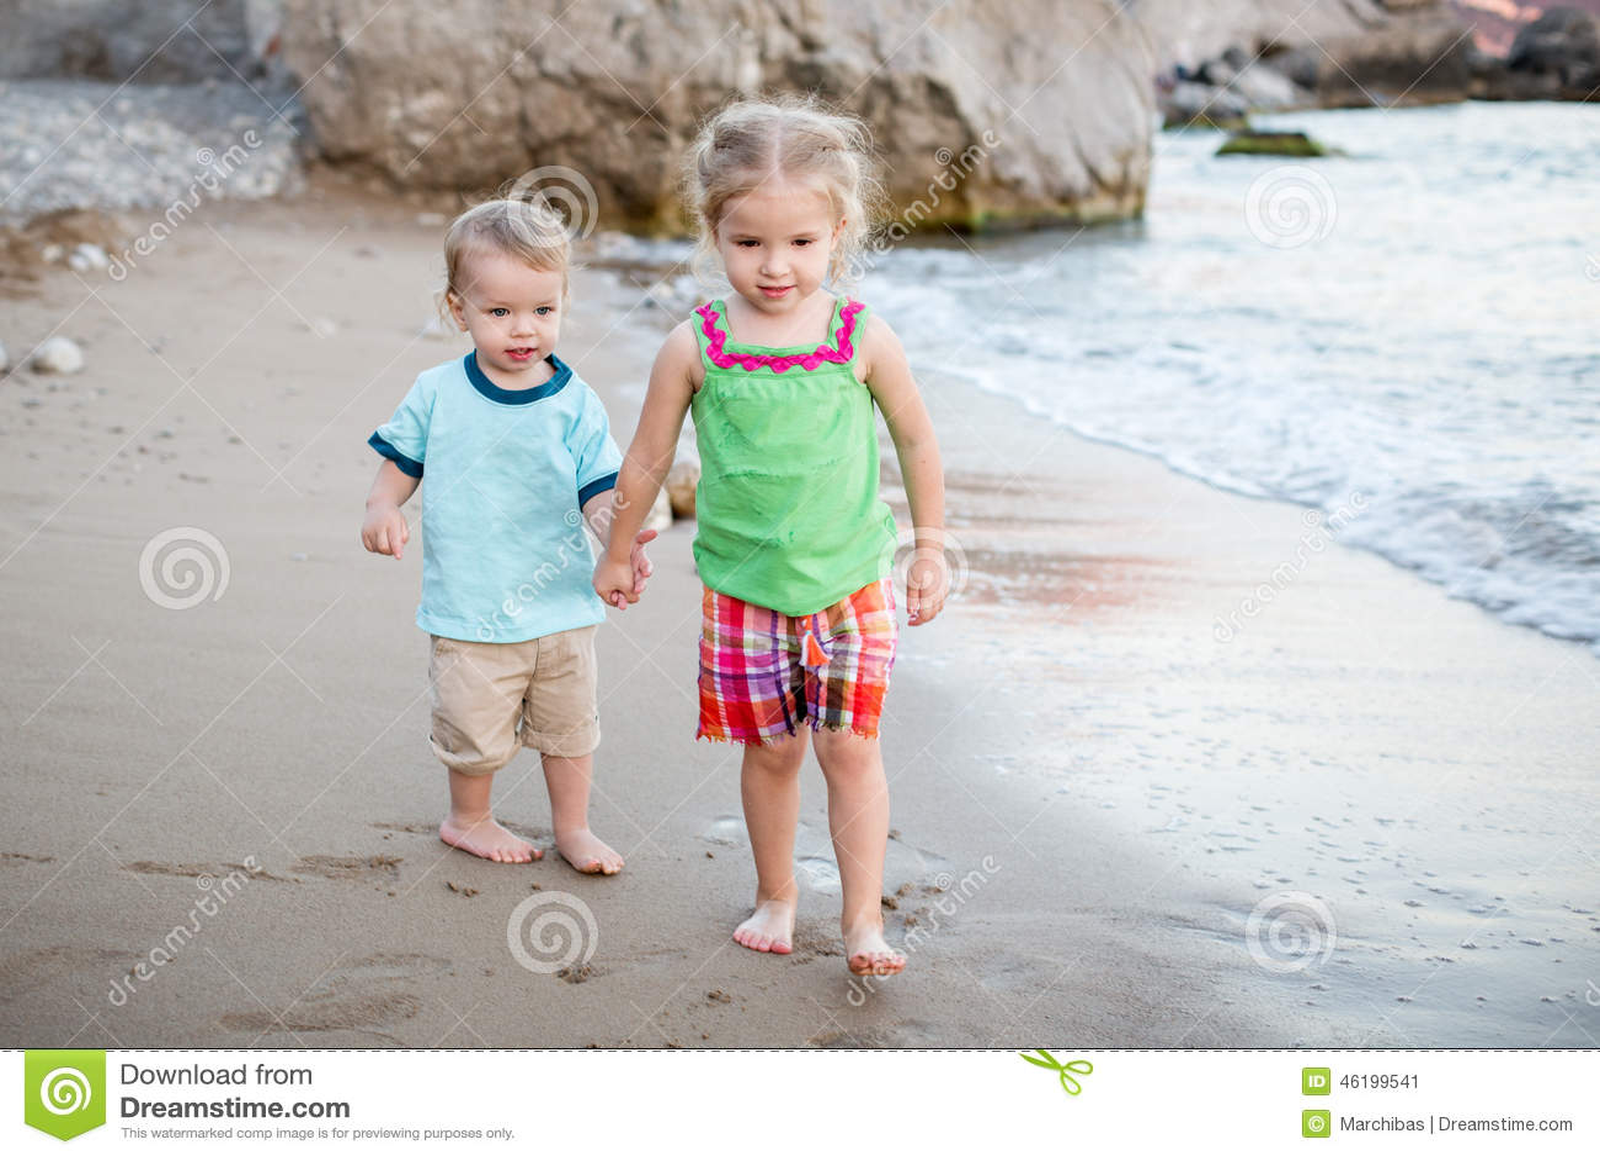 small-children-brother-sister-beach-walk